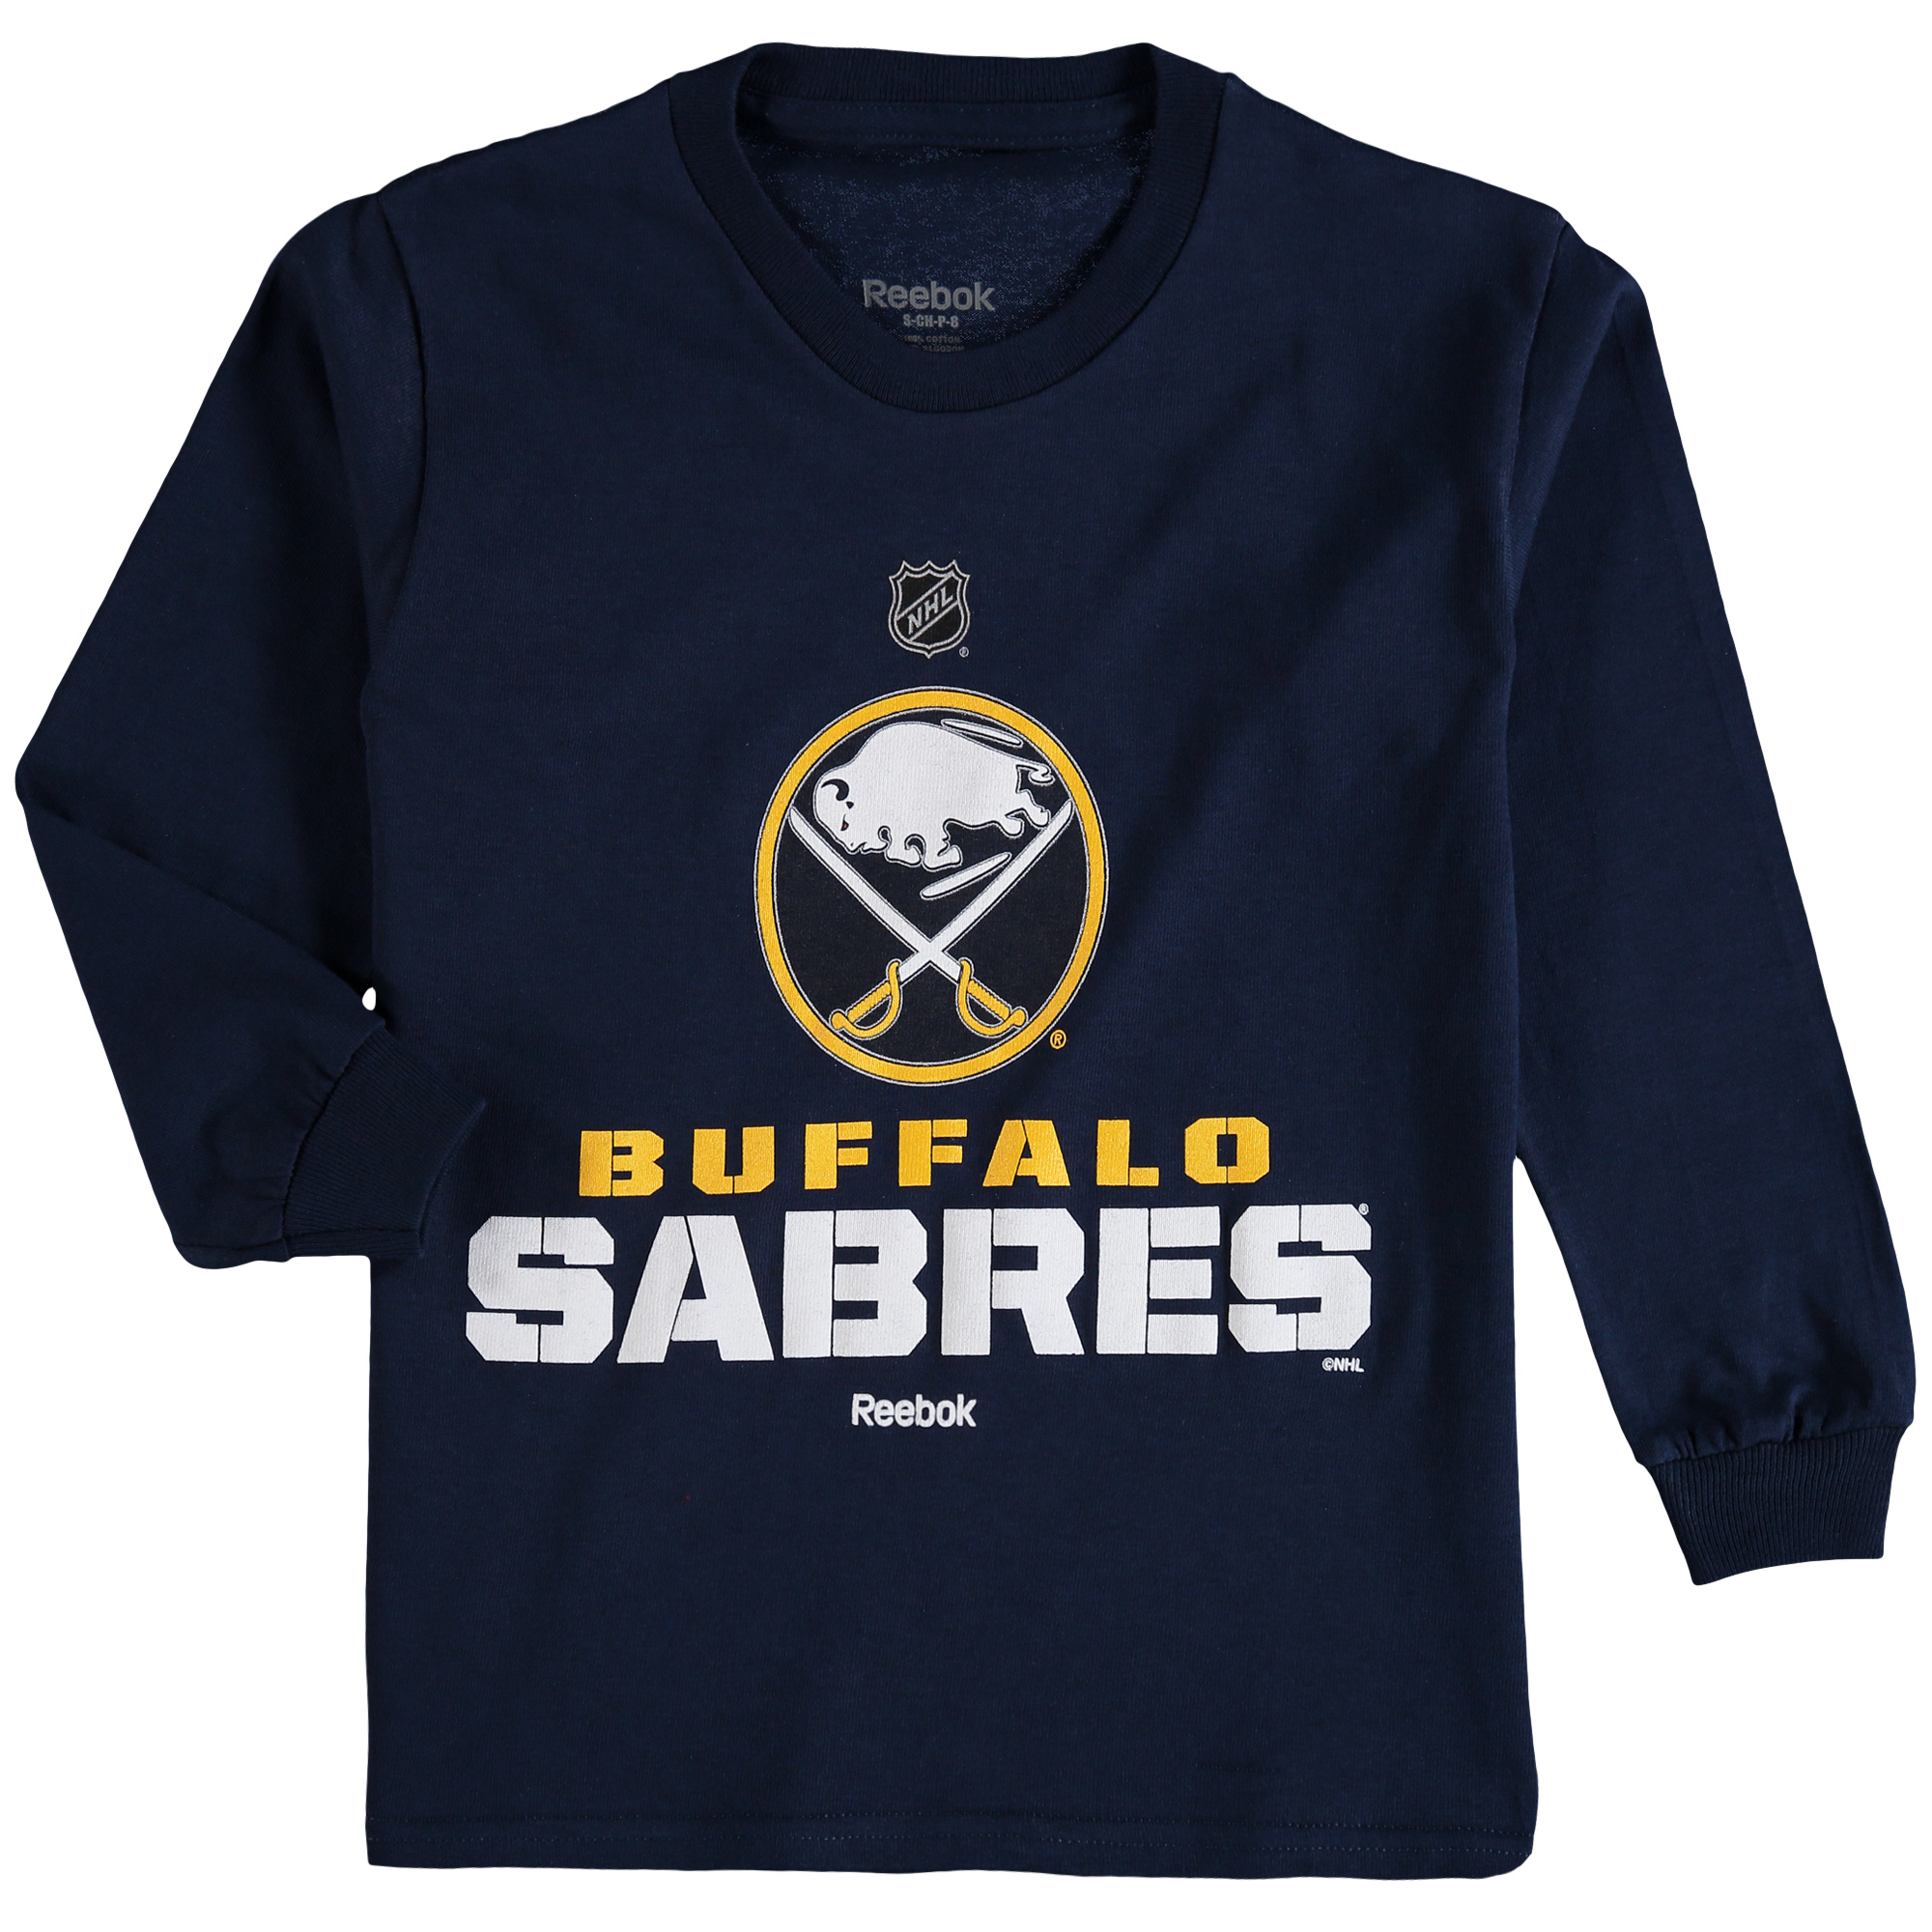 Buffalo Sabres Reebok Youth Clean Cut Long Sleeve T-Shirt - Navy